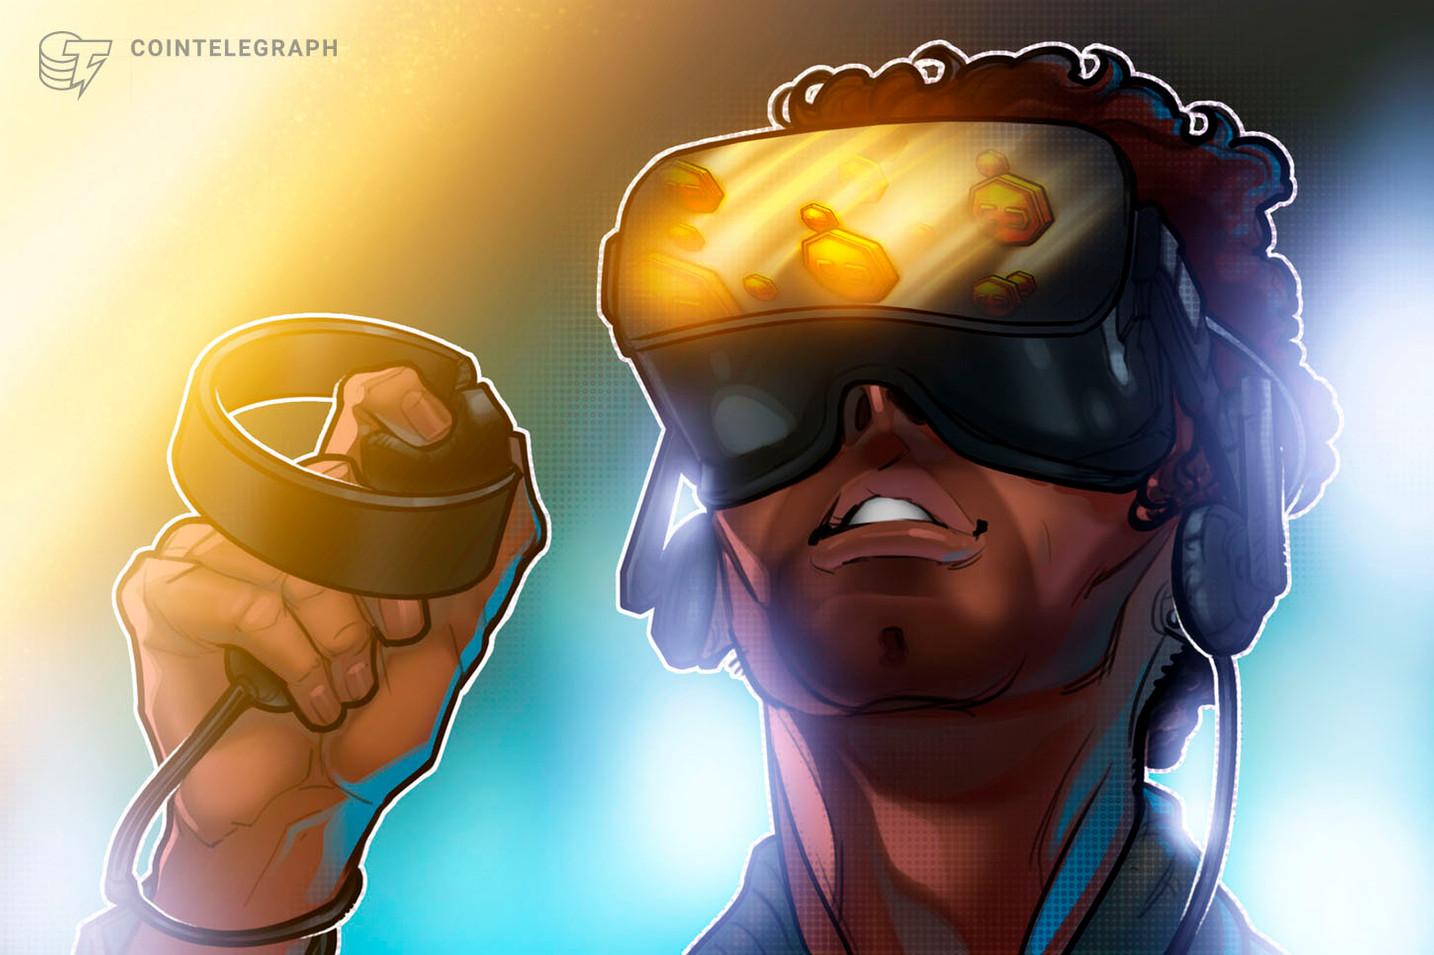 Atari's VCS reboot promises standard blockchain gaming features